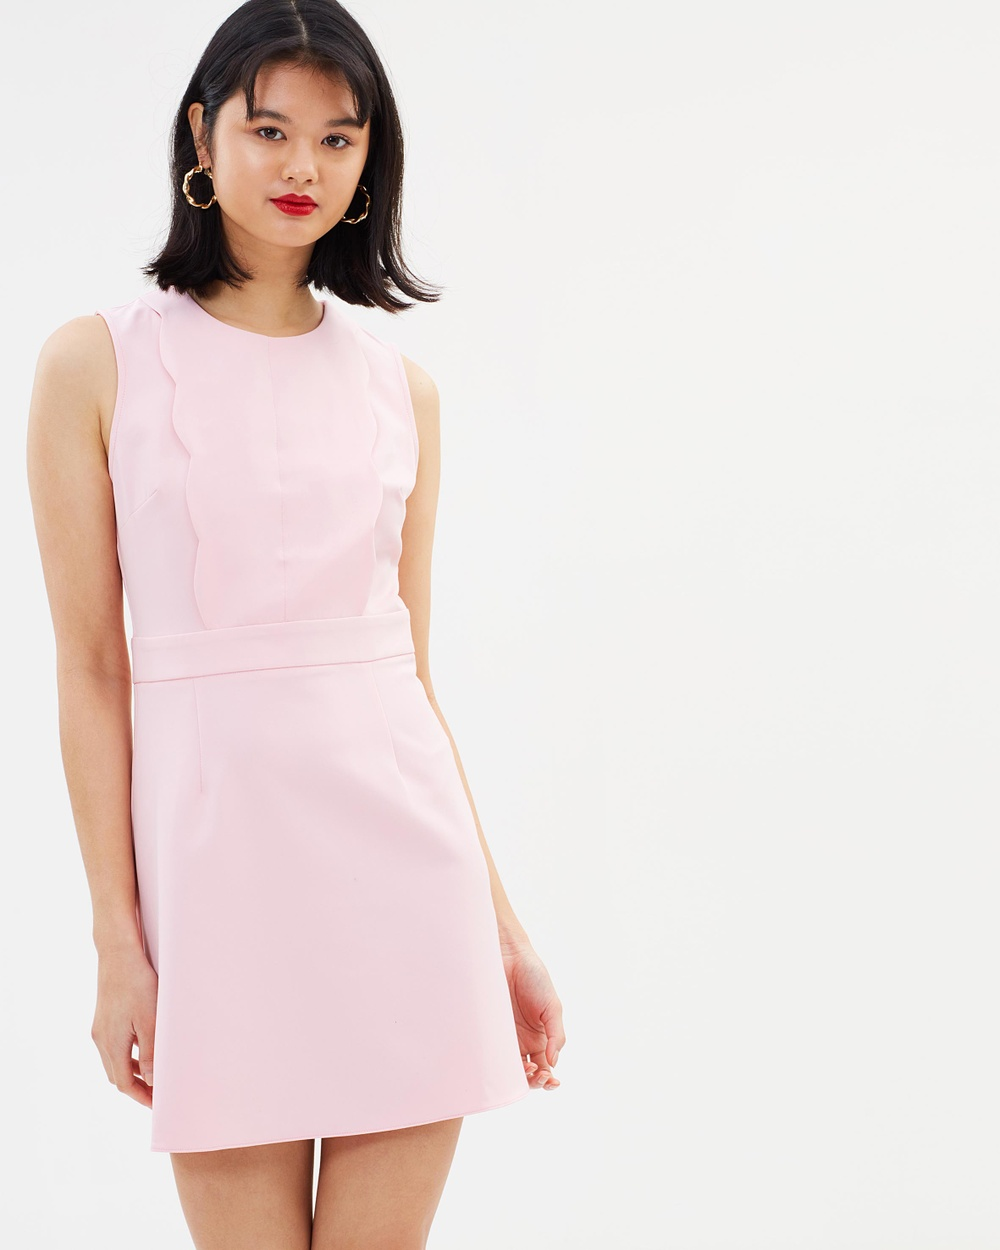 Miss Selfridge Scalloped Zip Dress Dresses Pink Scalloped Zip Dress